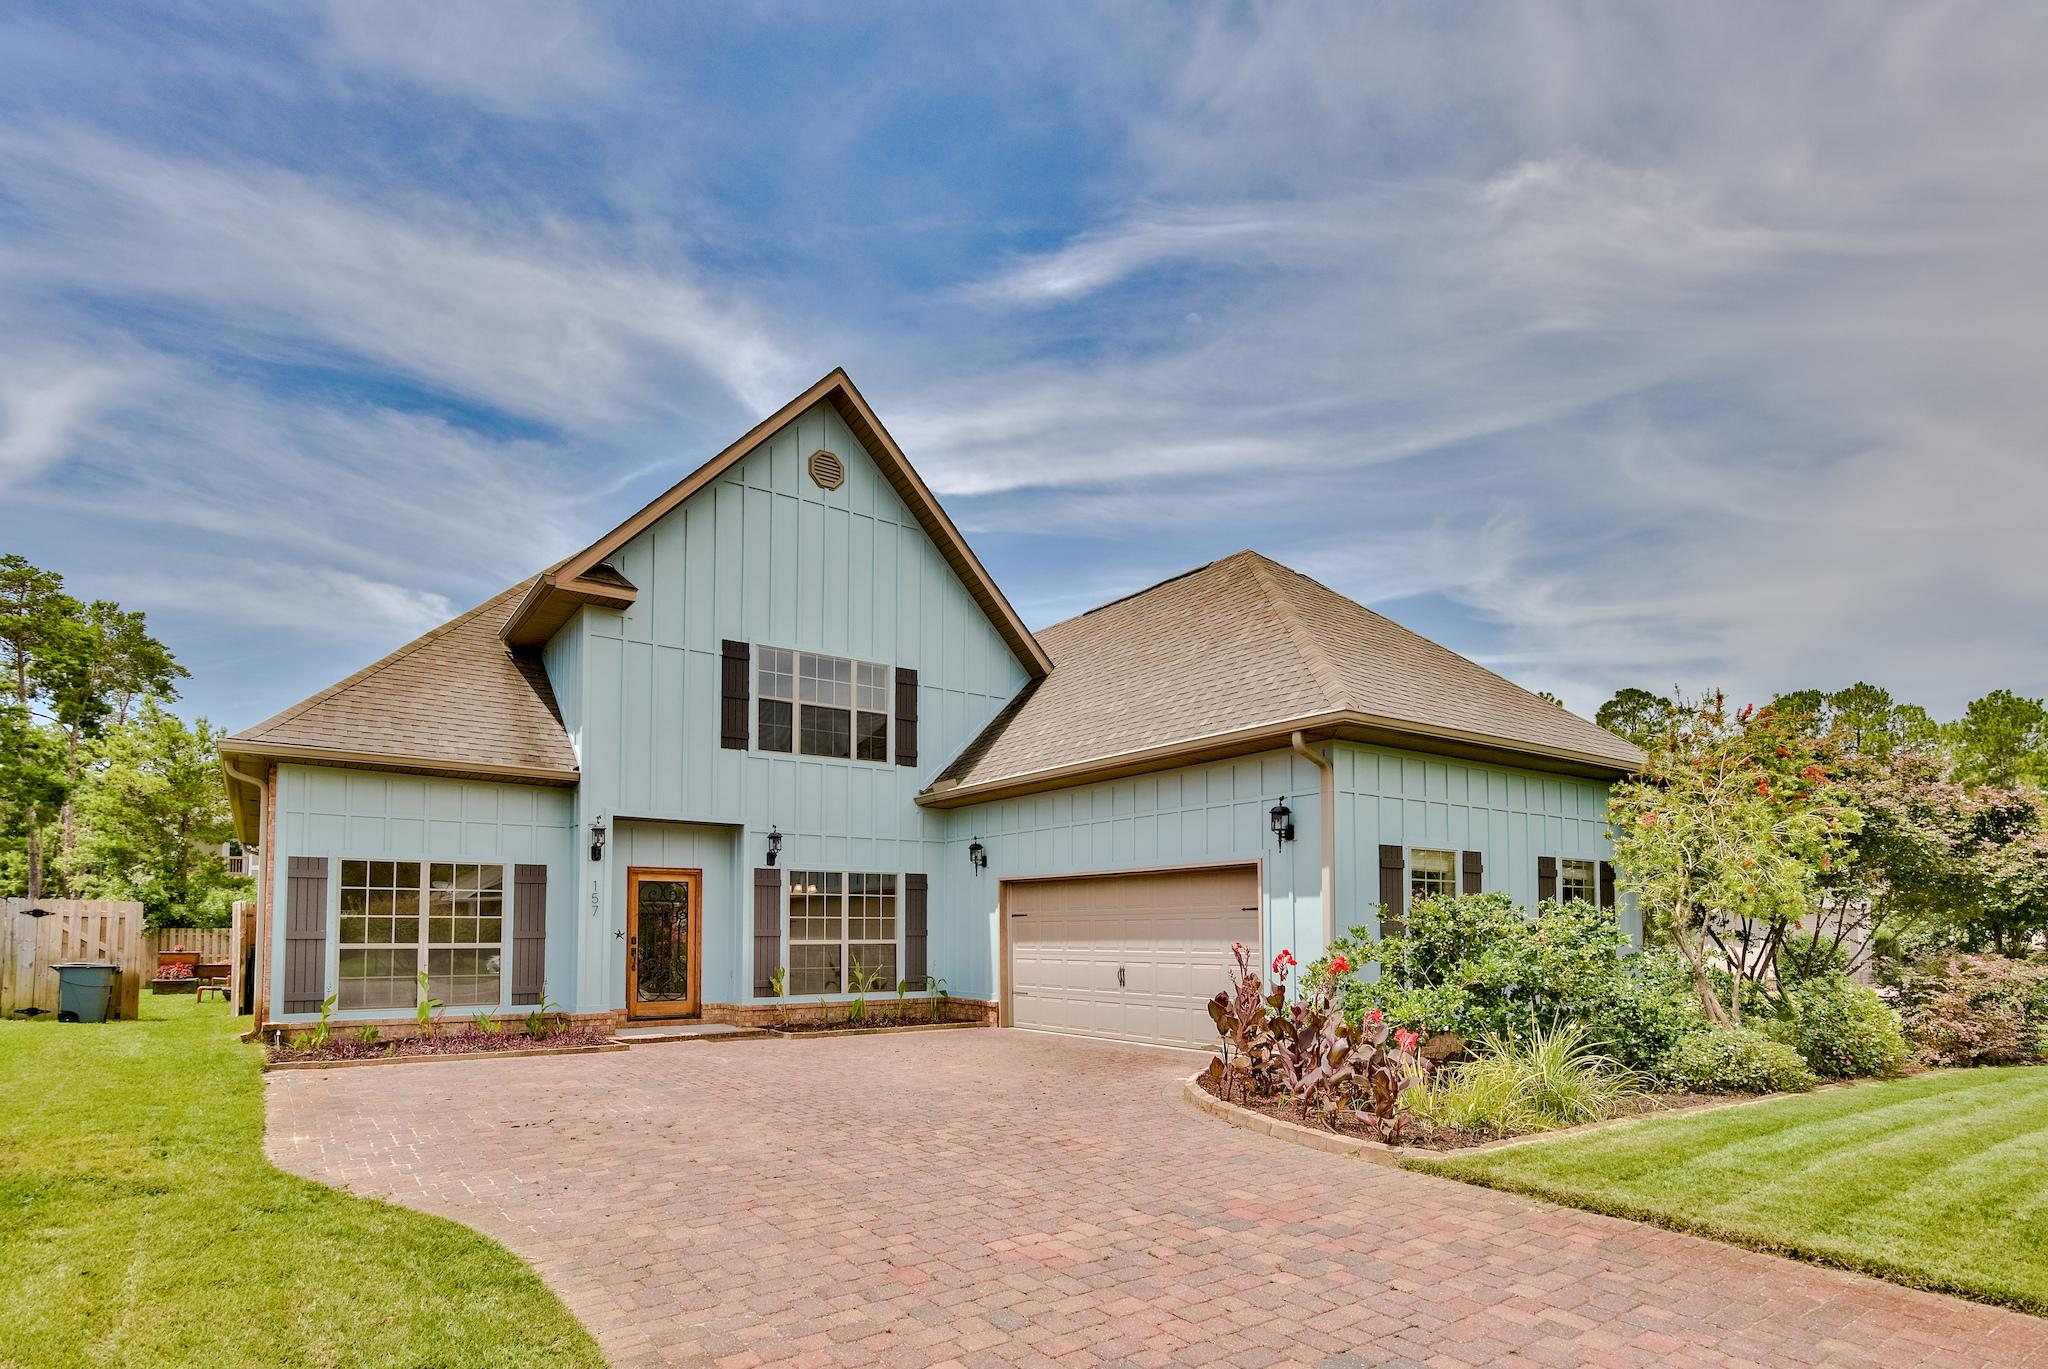 Photo of home for sale at 157 Mussett Bayou, Santa Rosa Beach FL